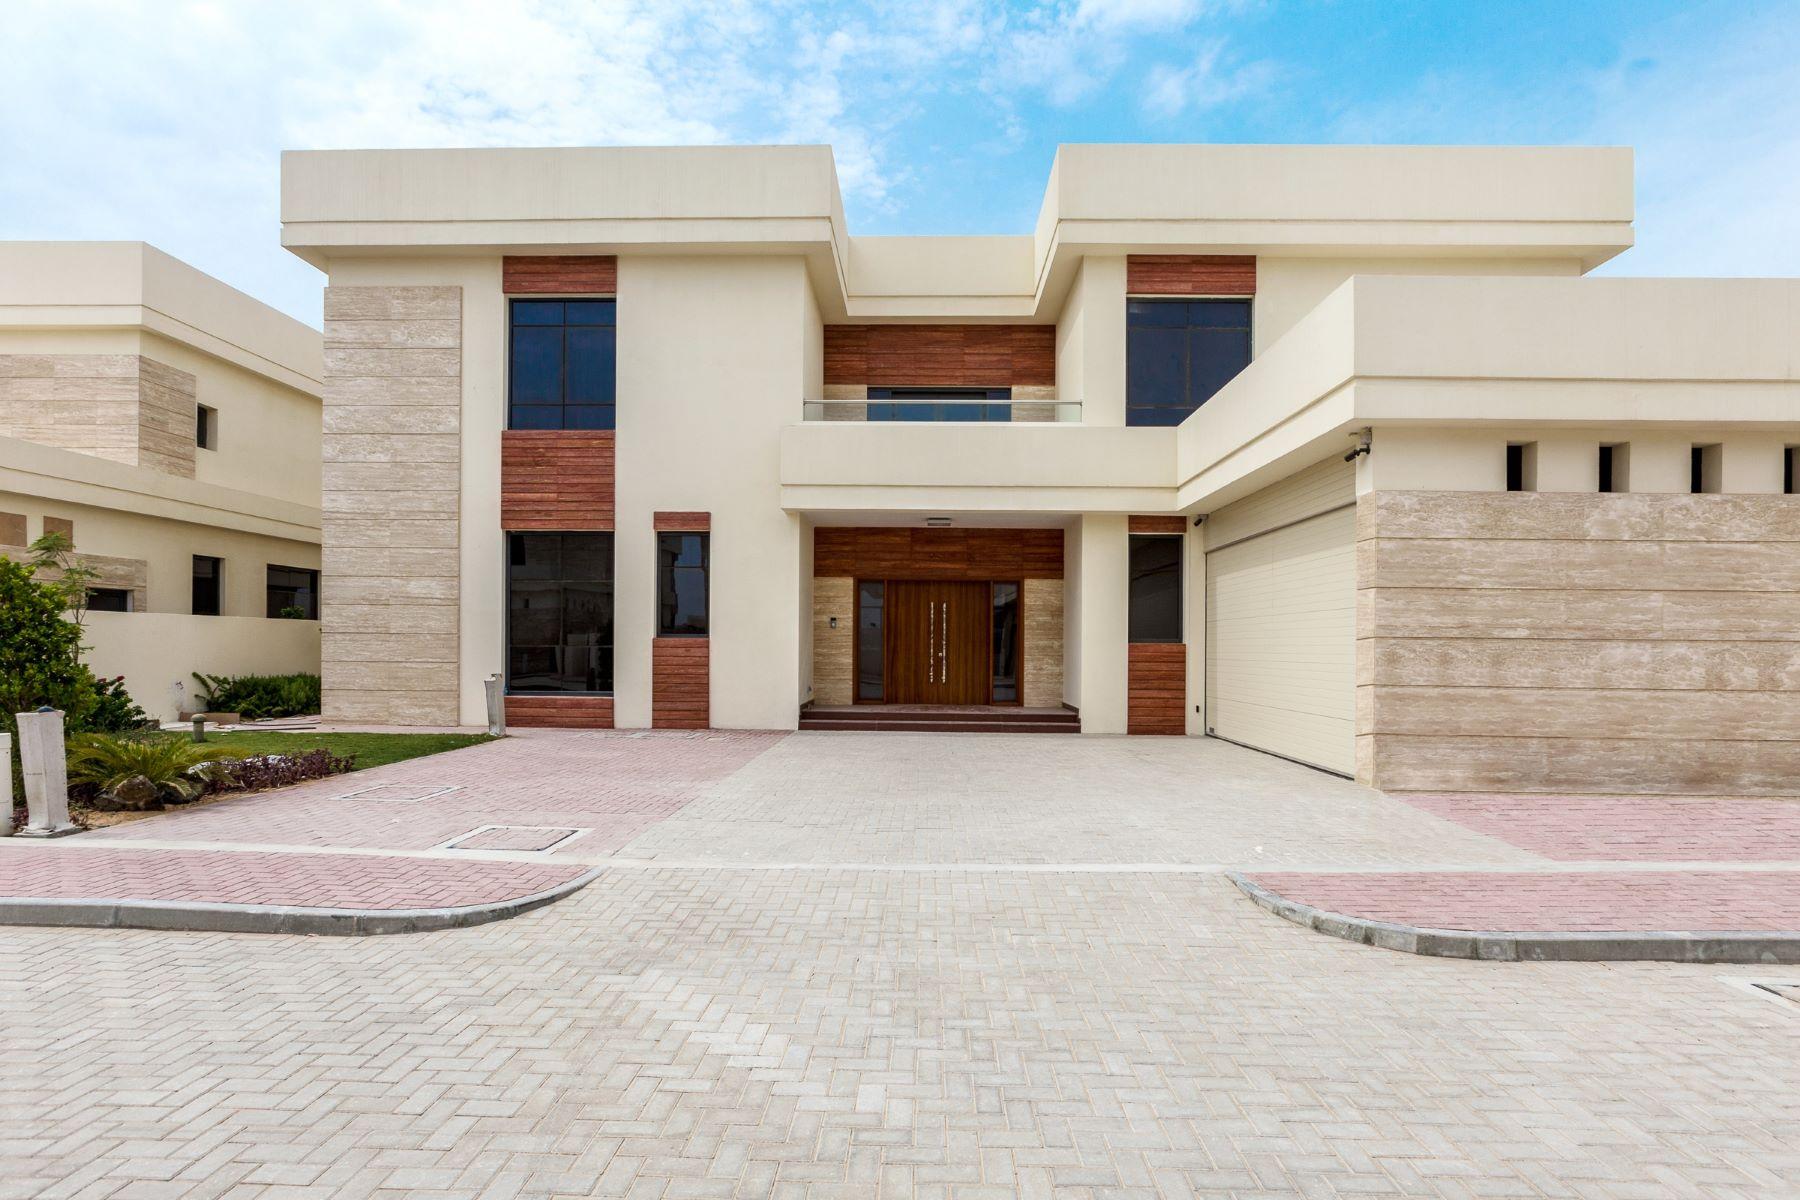 Additional photo for property listing at VIP Frond  4 Luxury Villas Tip Location Dubai, Dubai United Arab Emirates